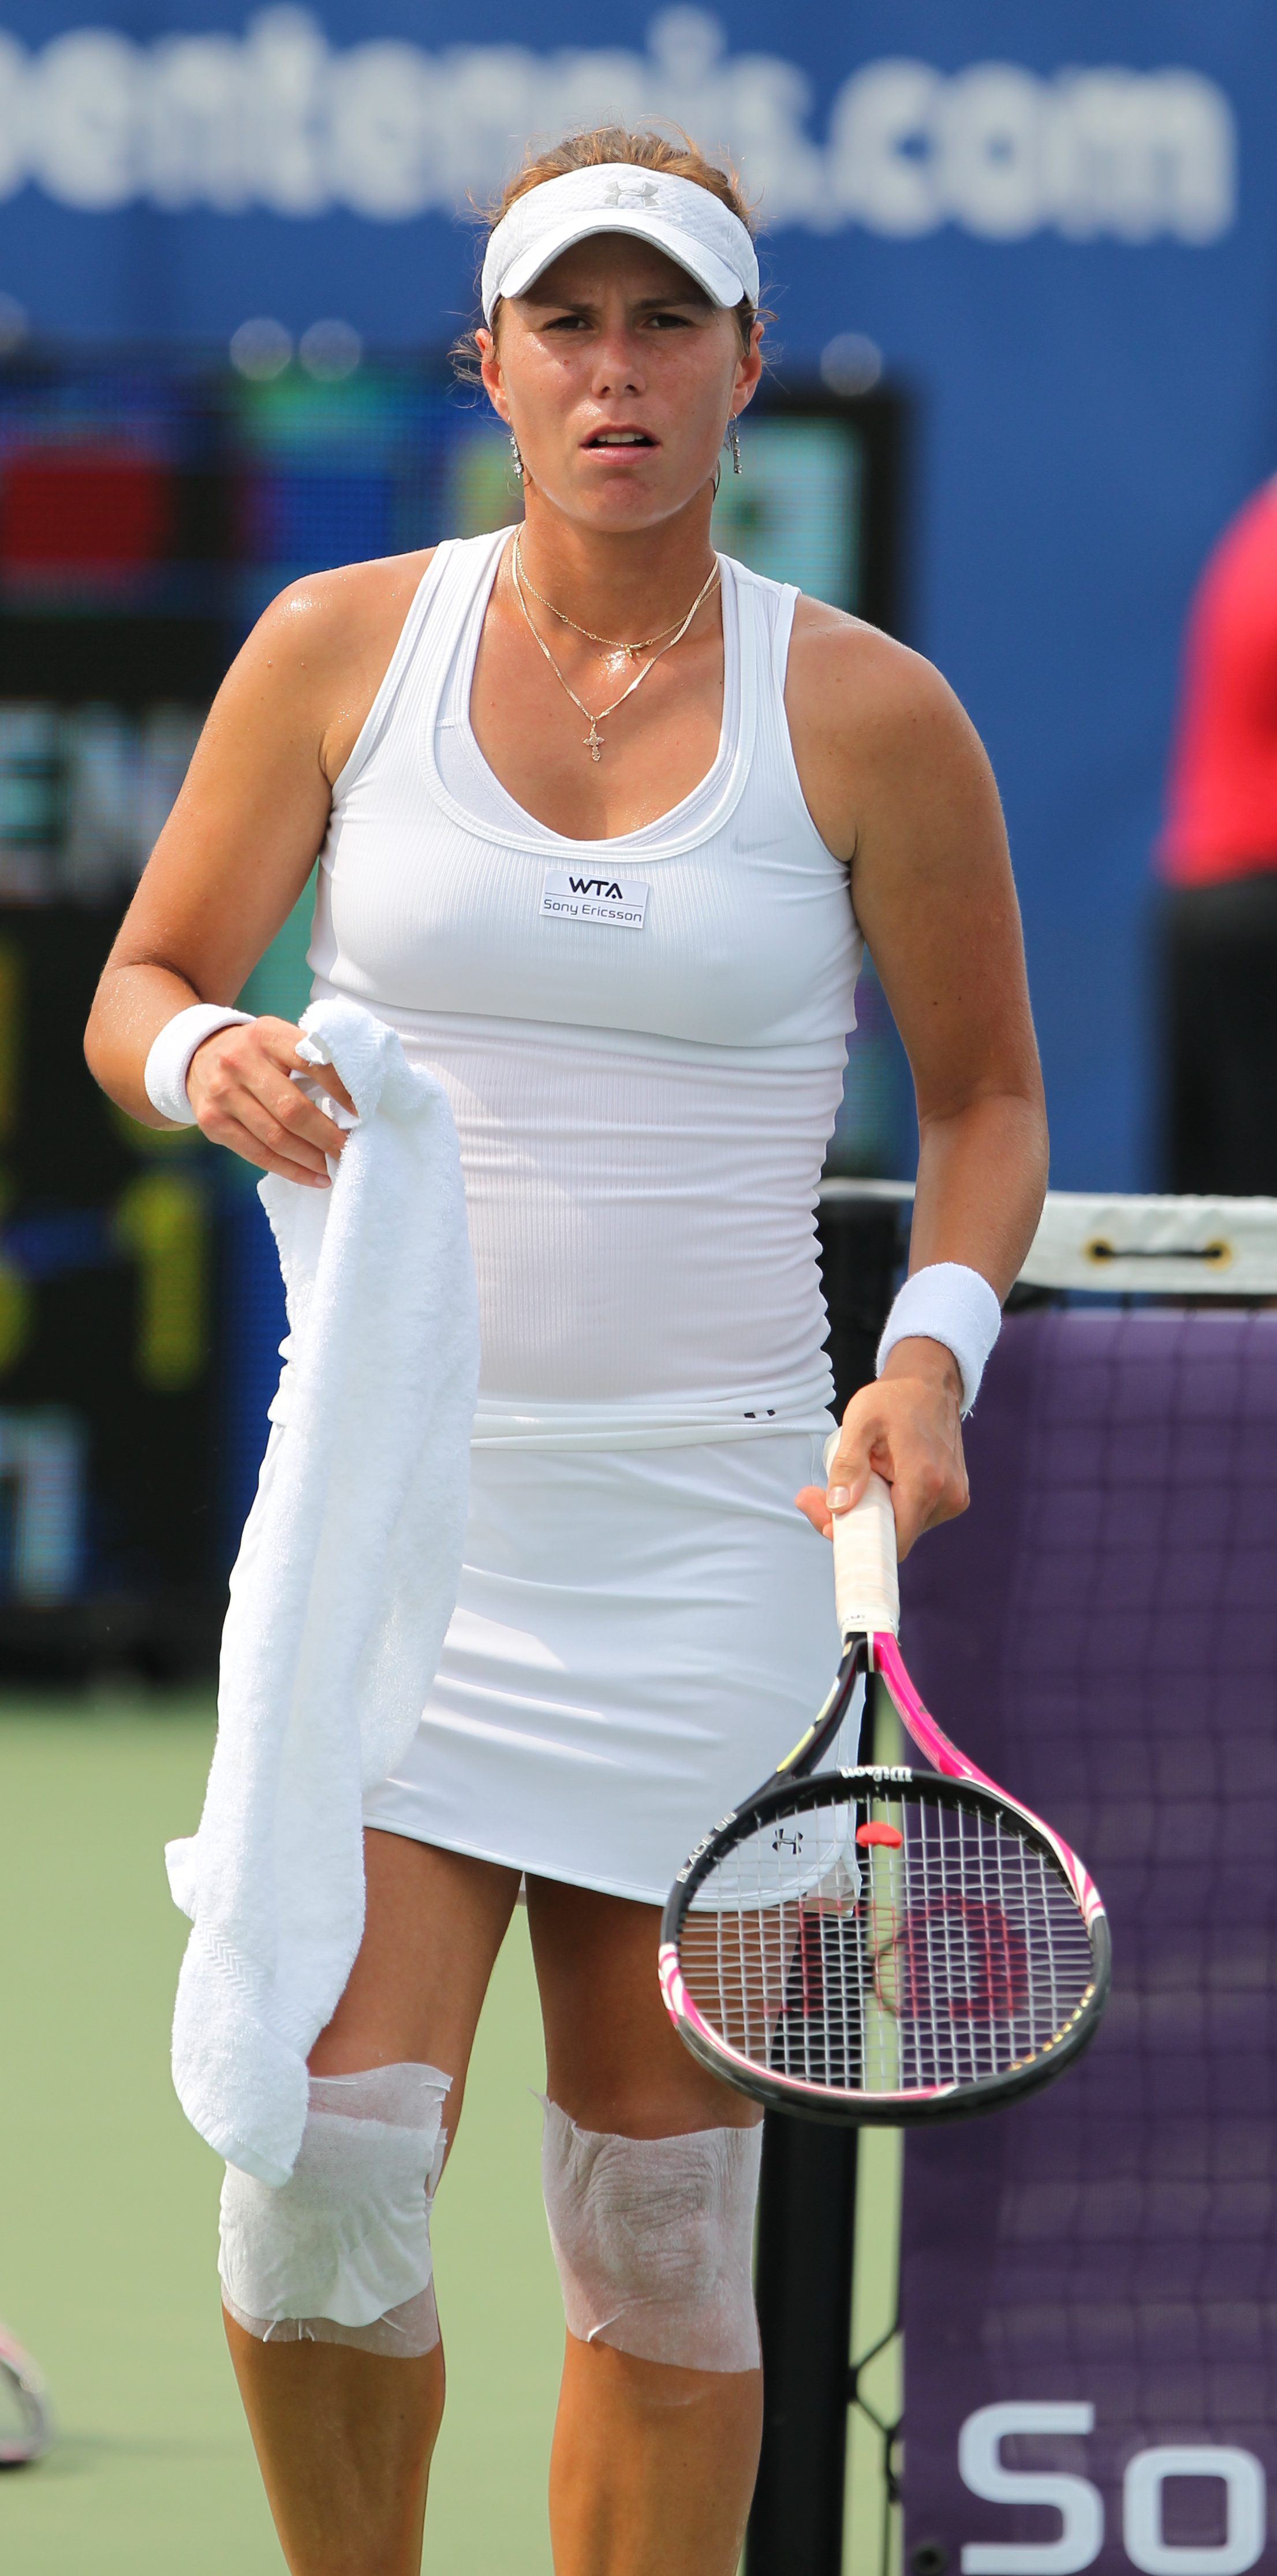 File:Varvara Lepchenko (5986748532).jpg - Wikimedia Commons Varvara Lepchenko Tennis